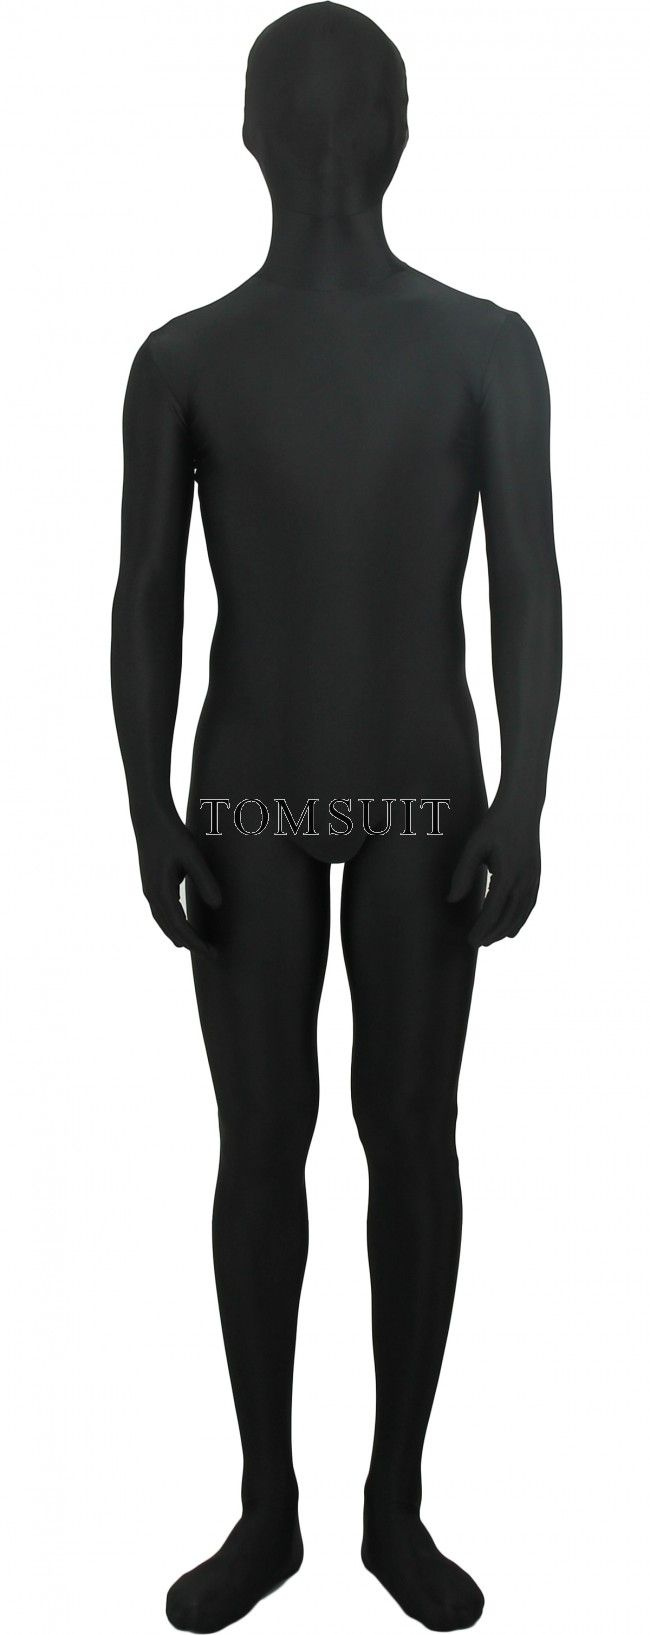 TOMSUIT Full Body Unitard One Piece Lycra Spandex Zentai Suit